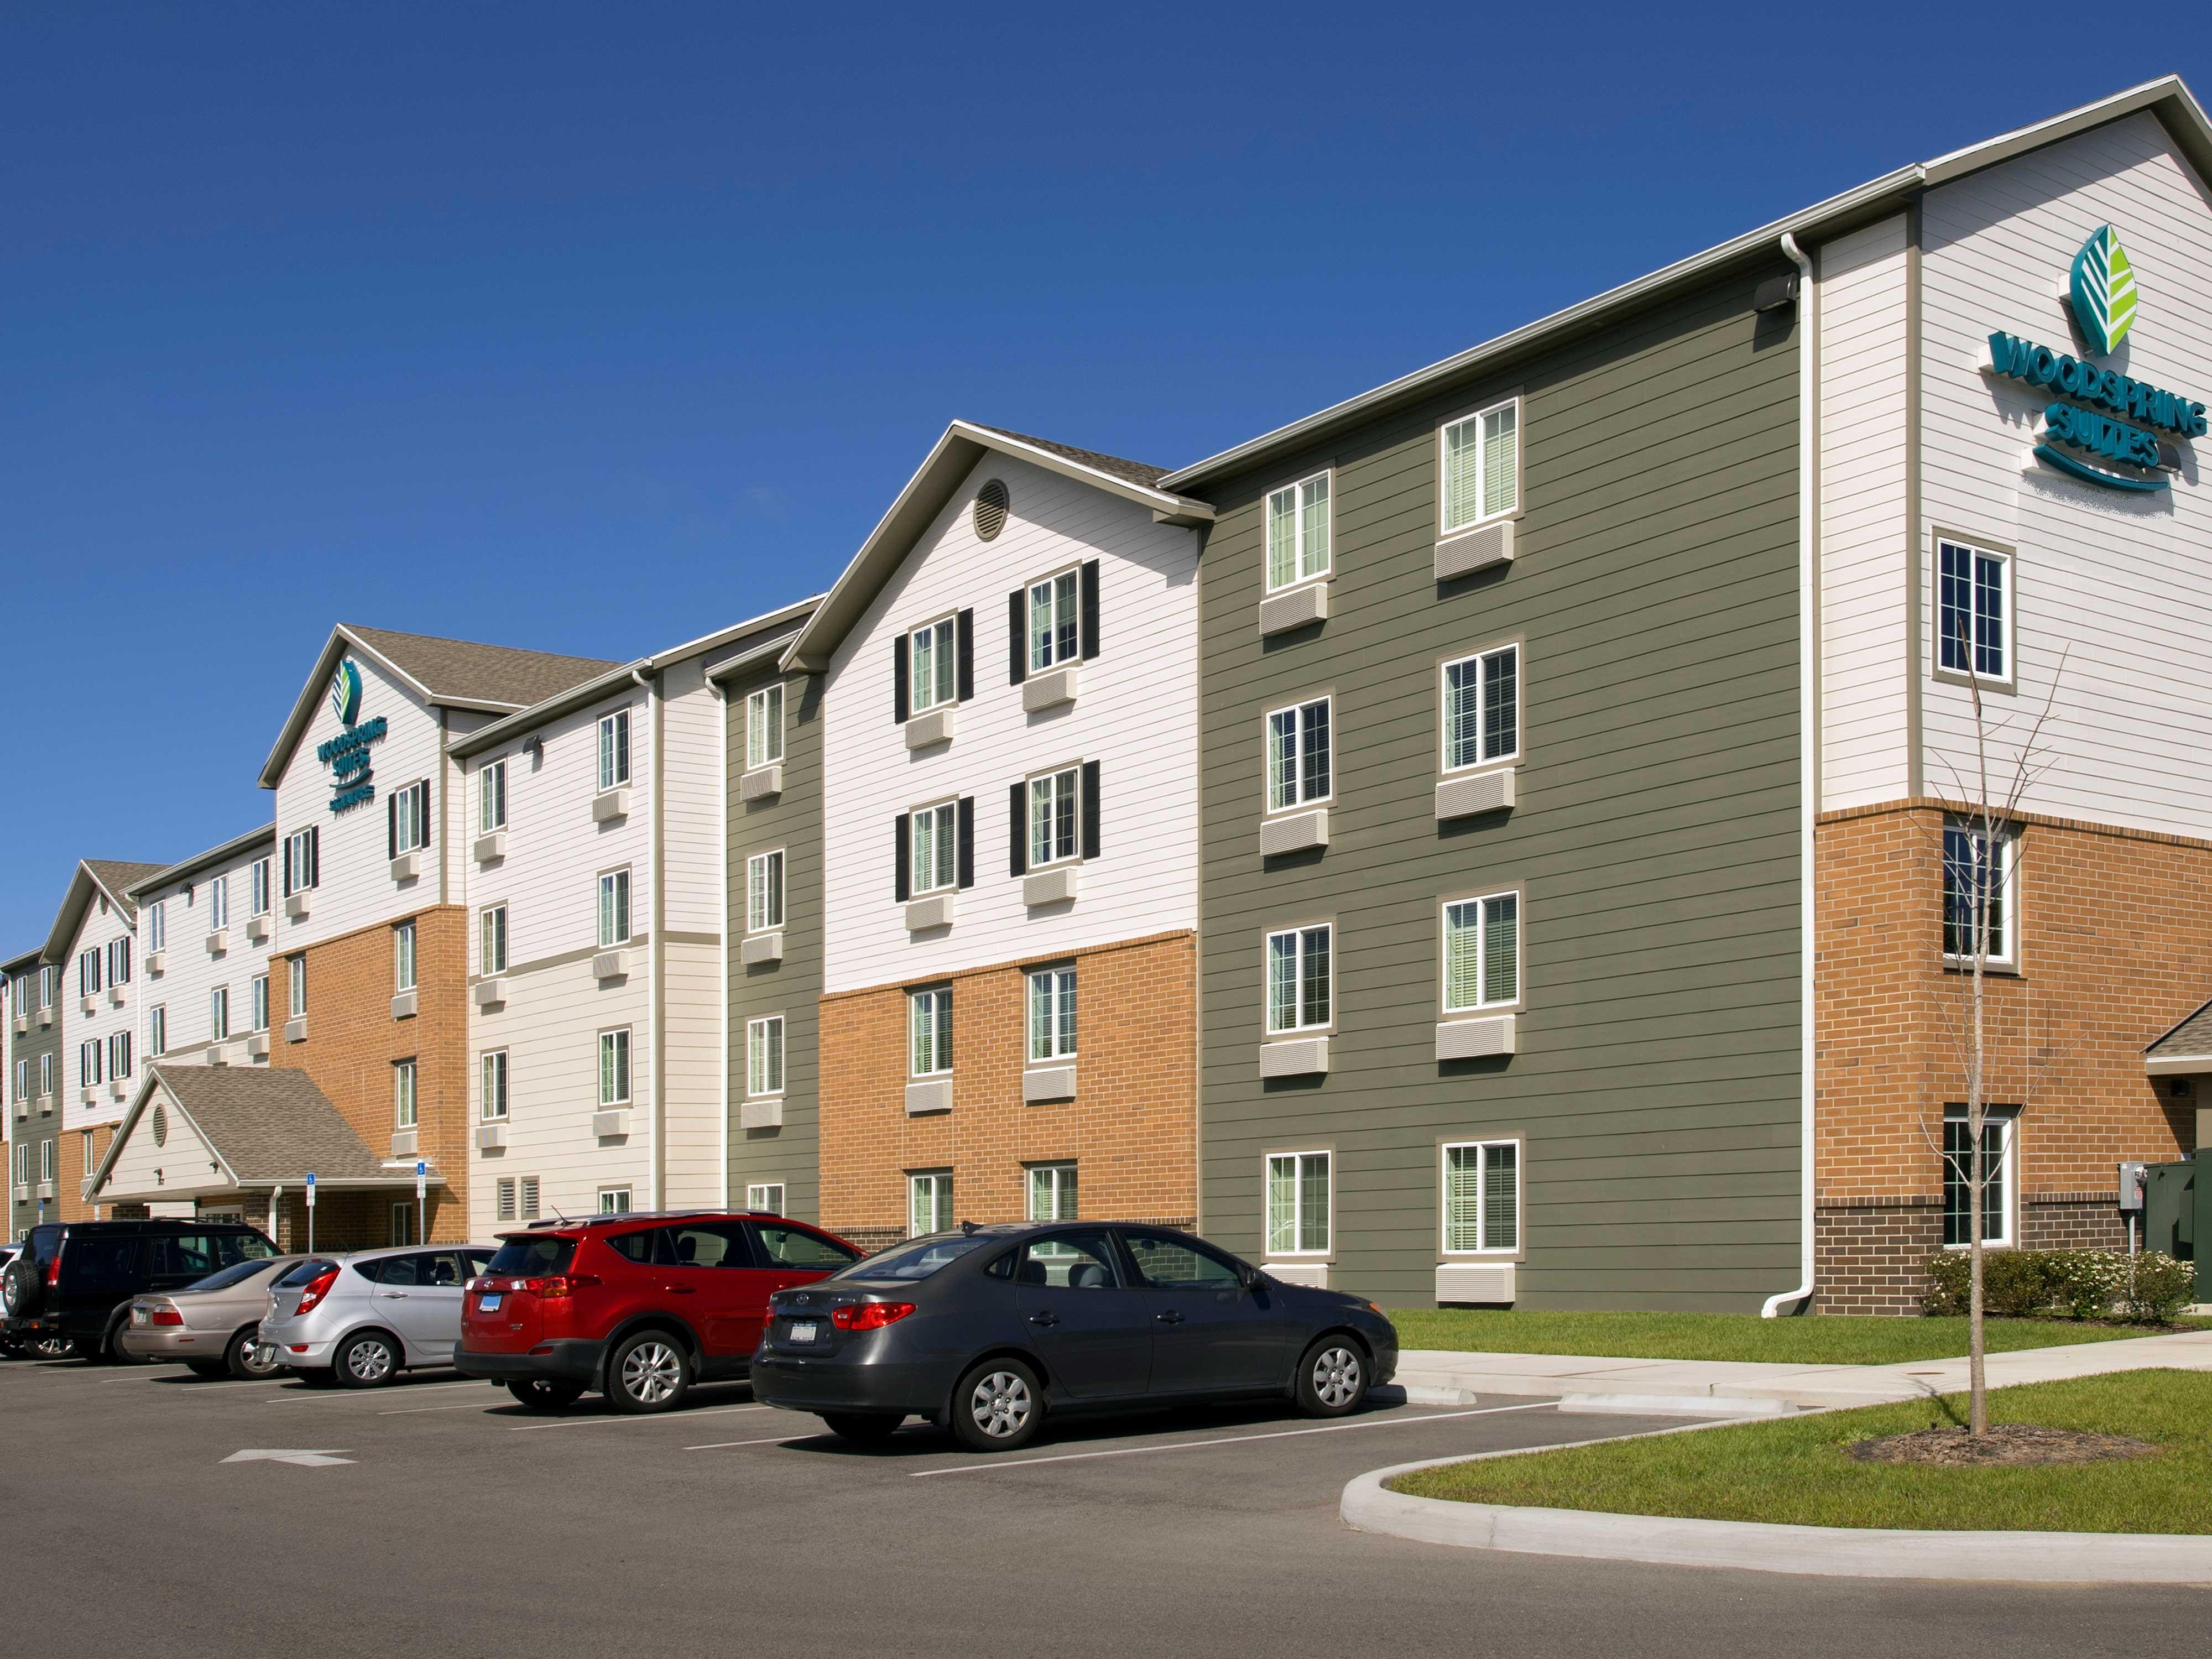 WoodSpring Suites Clearwater image 0